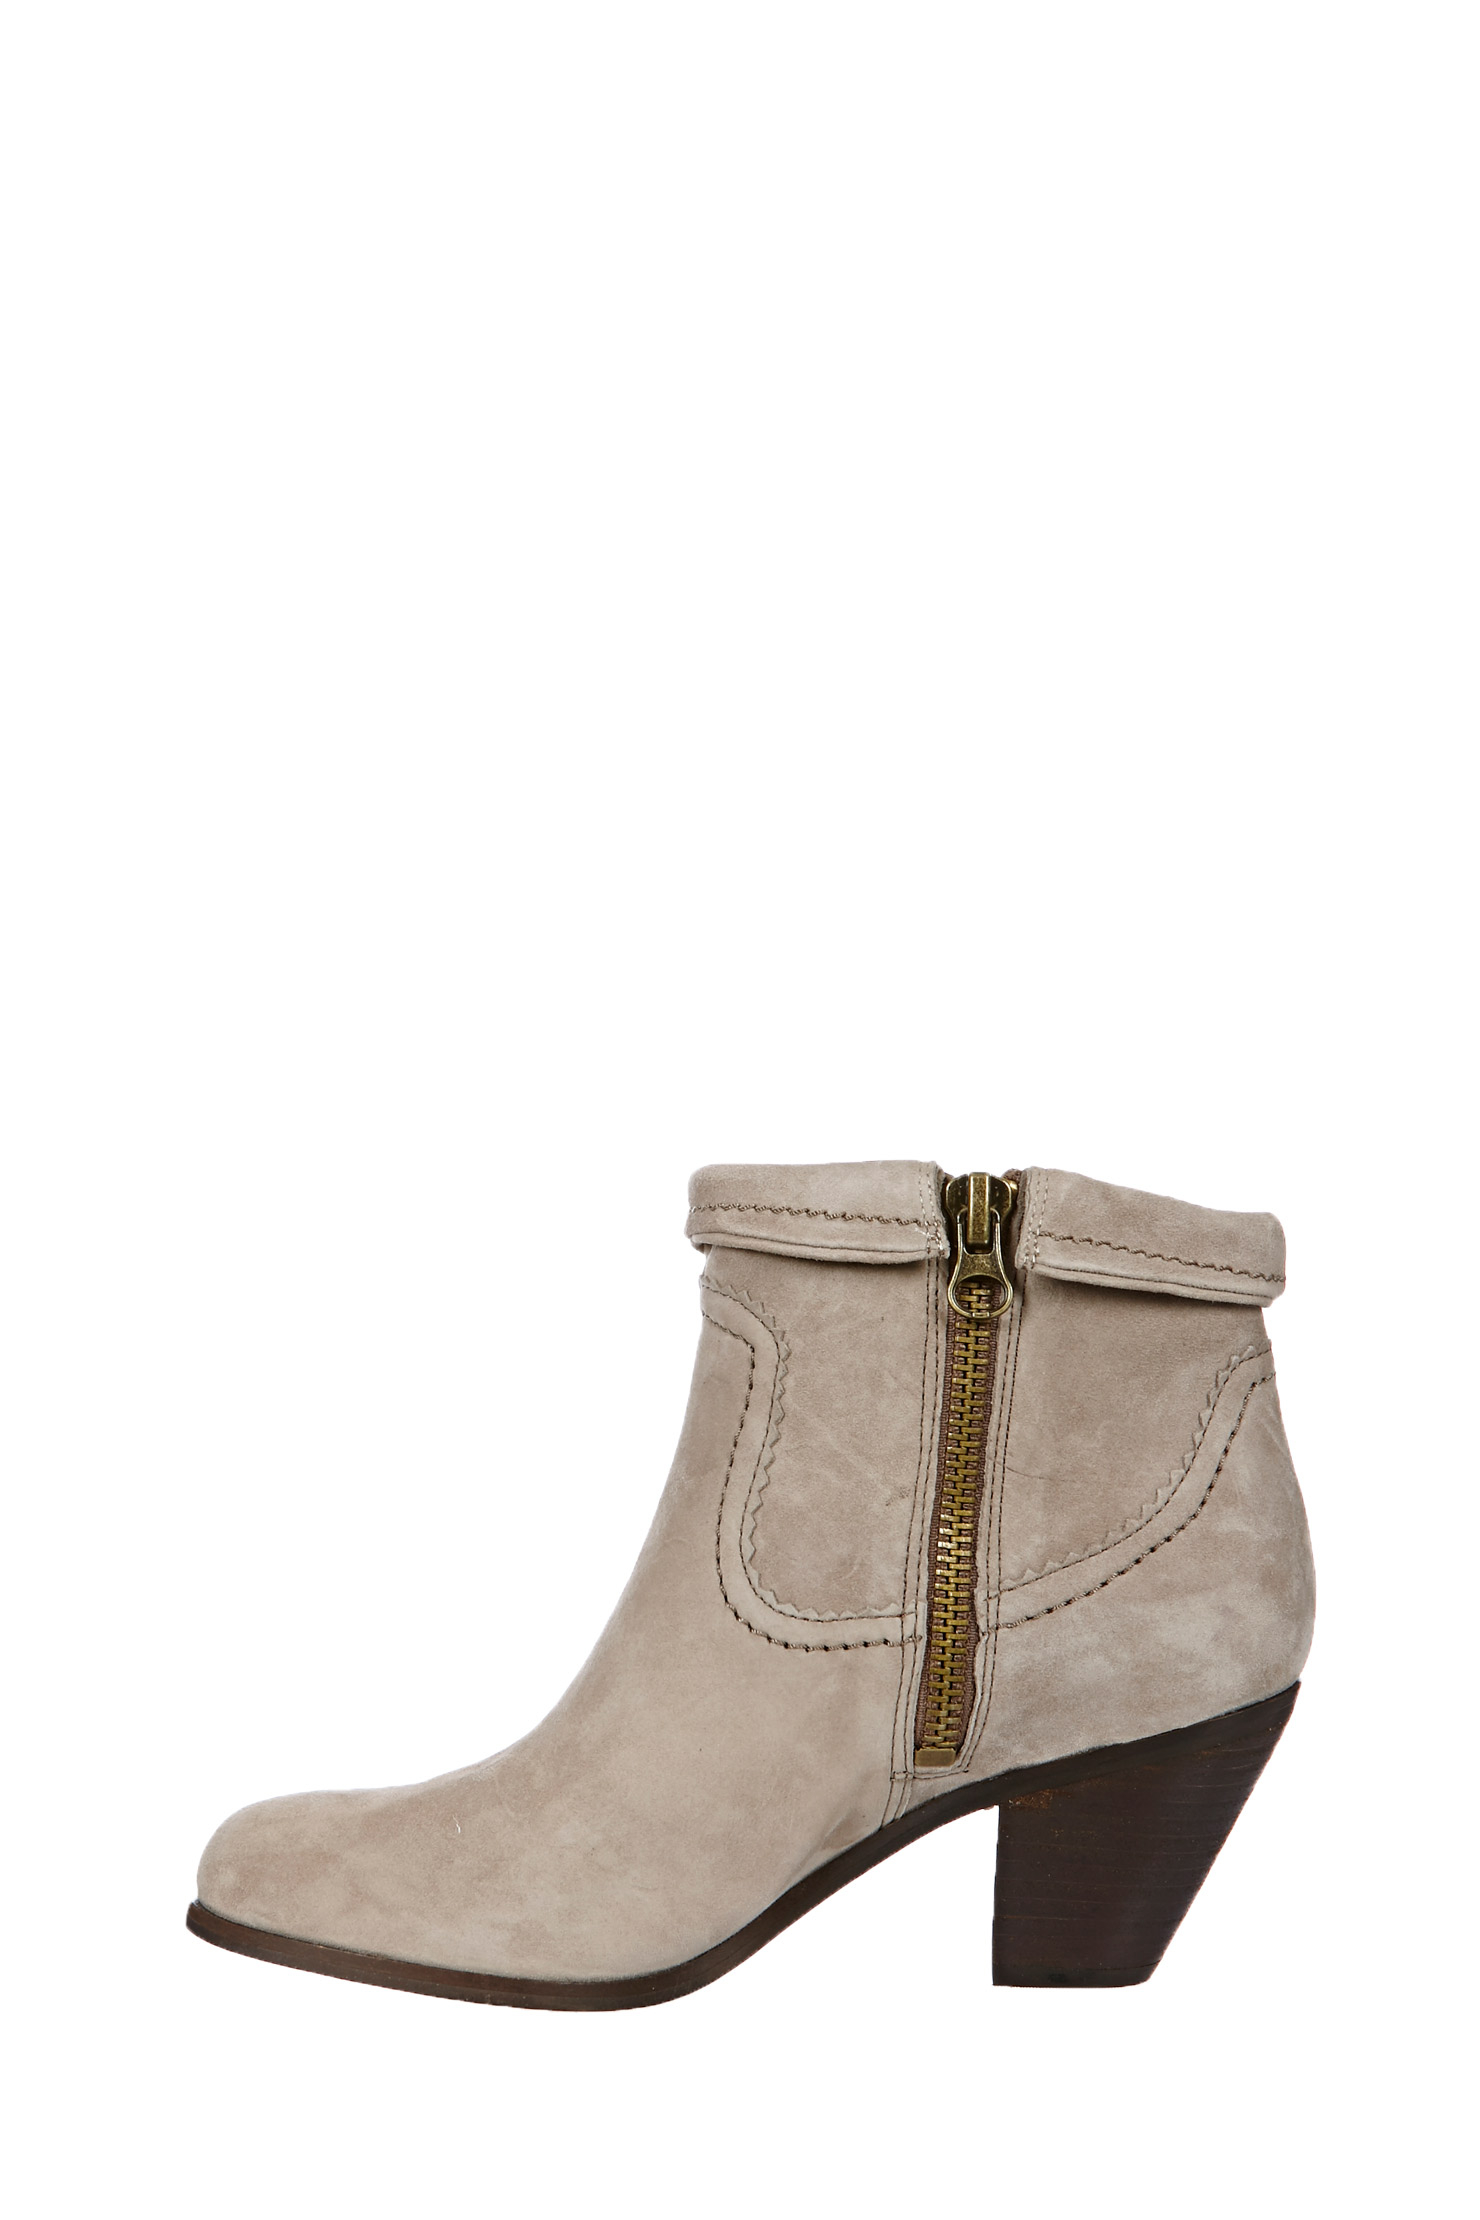 sam edelman boots in gray lyst